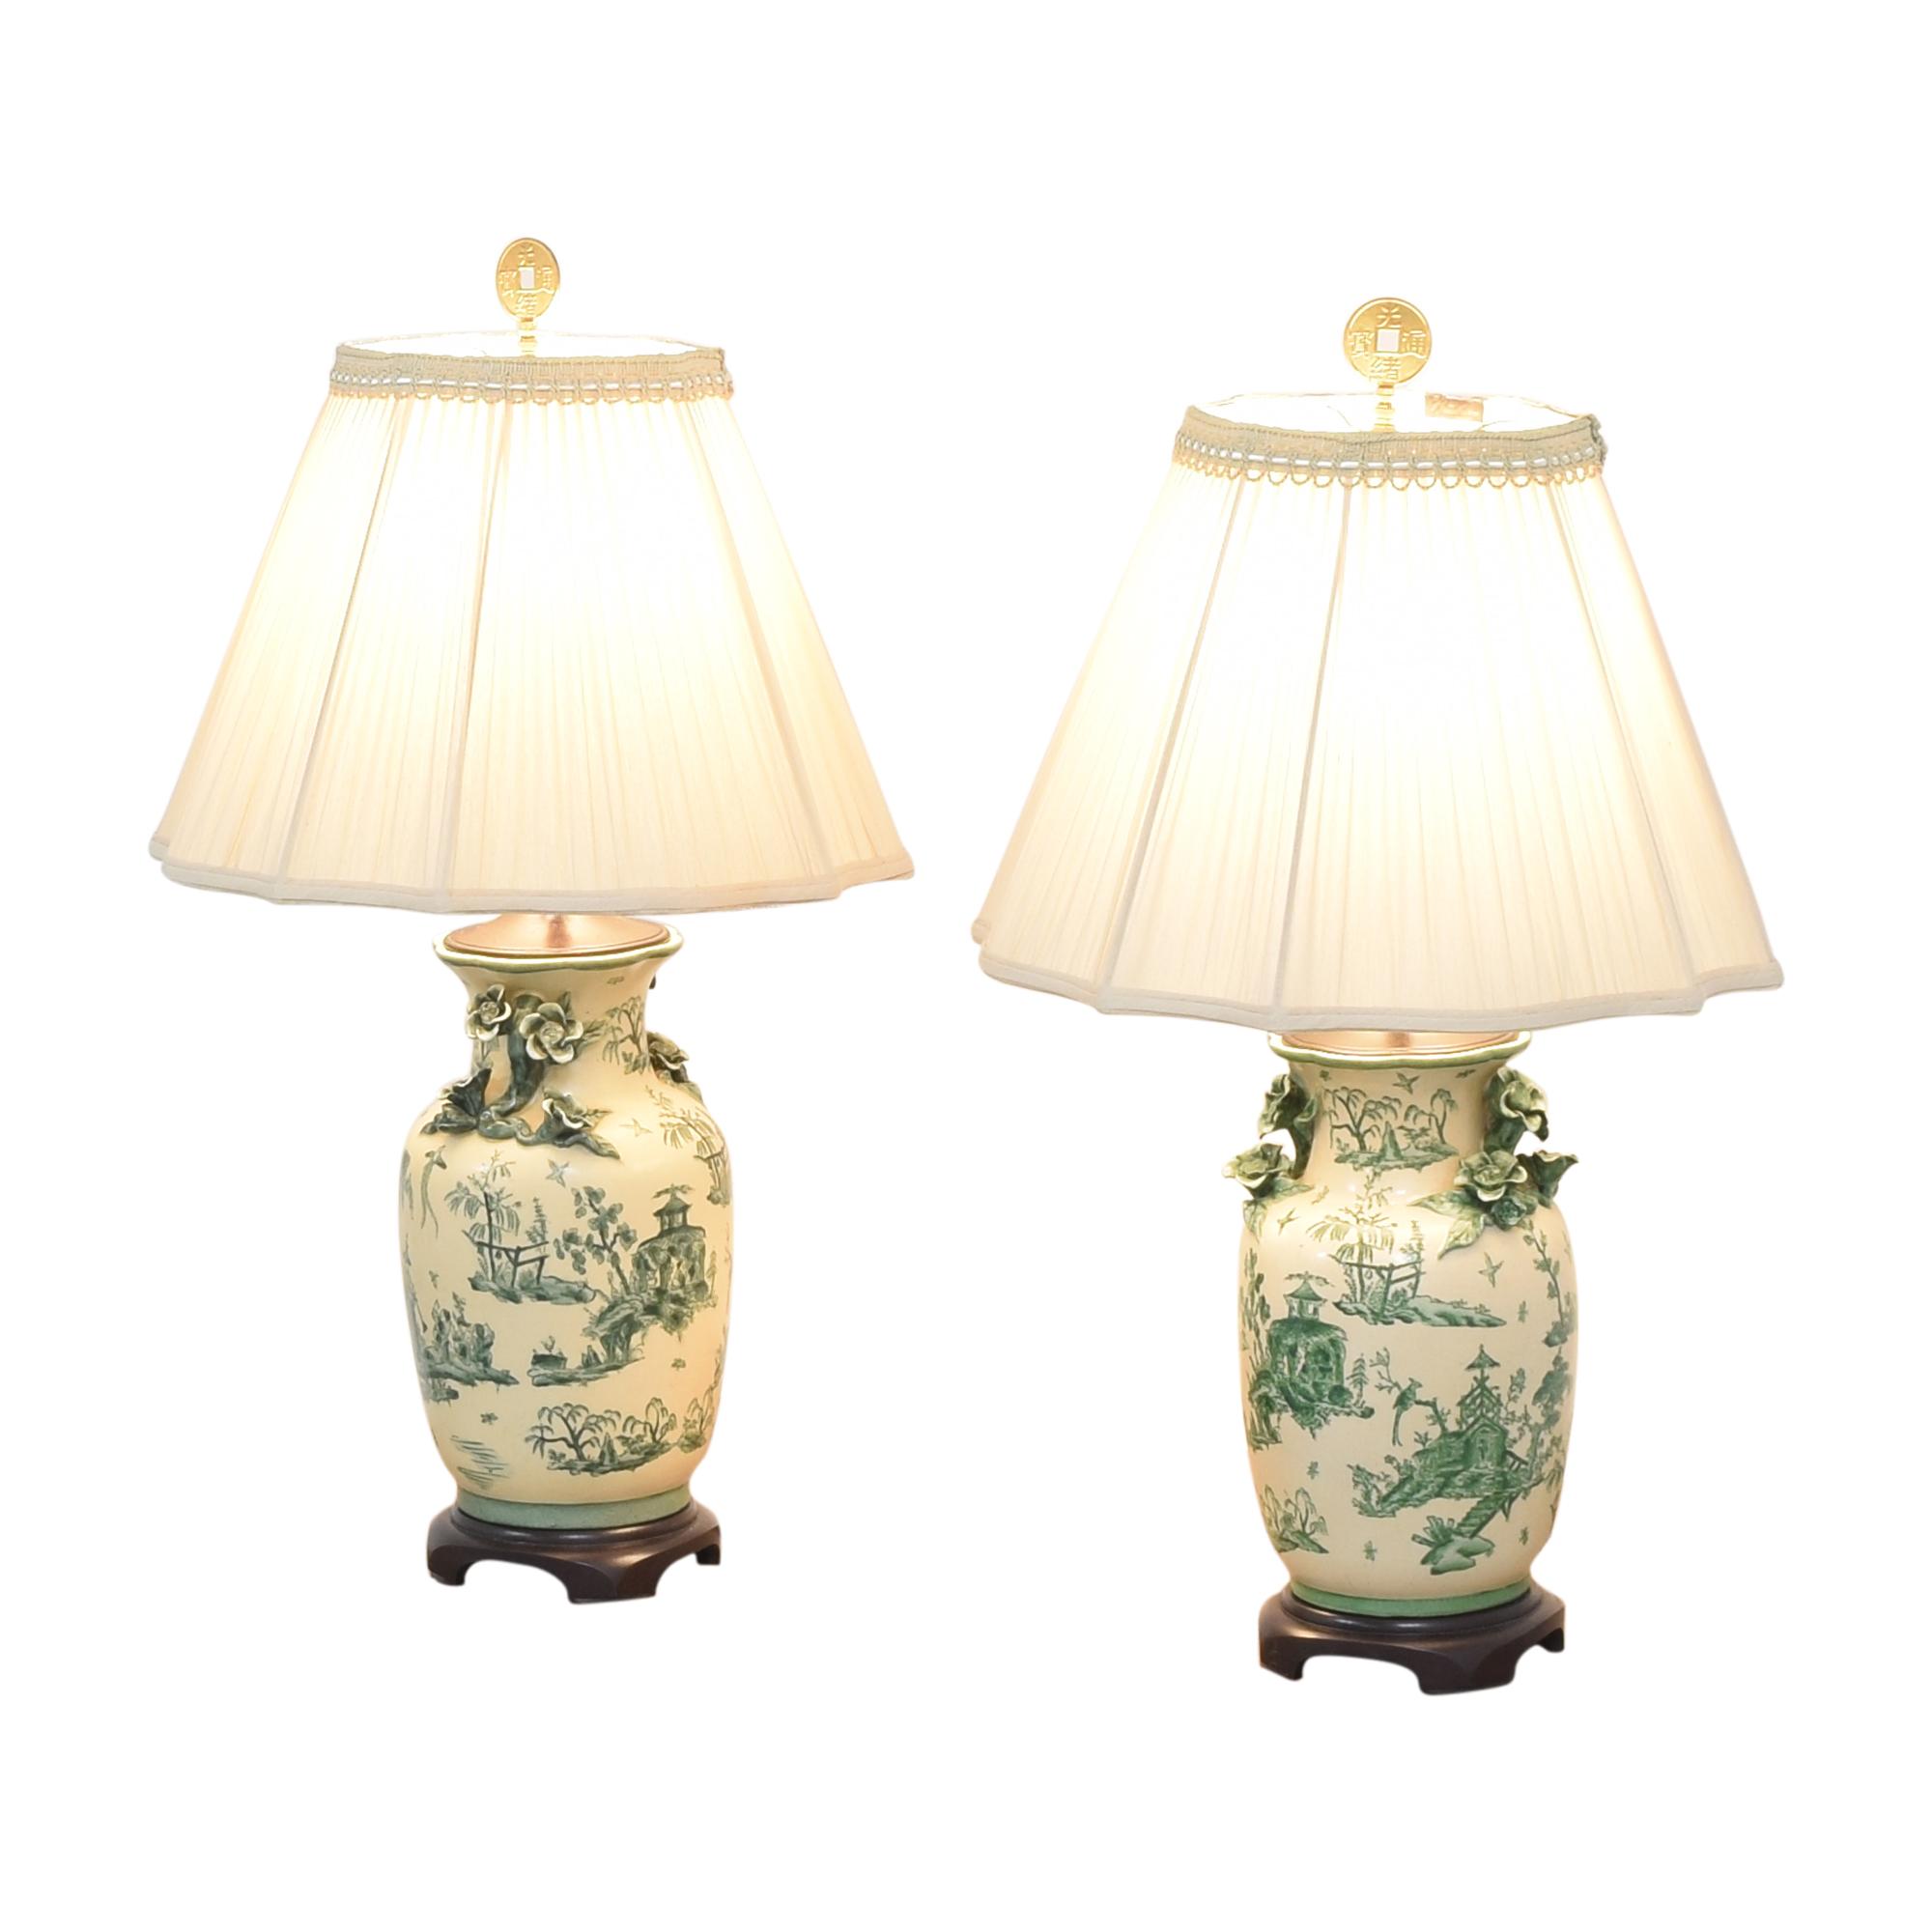 The Bradburn Gallery The Bradburn Gallery Oriental Vase Table Lamps multi